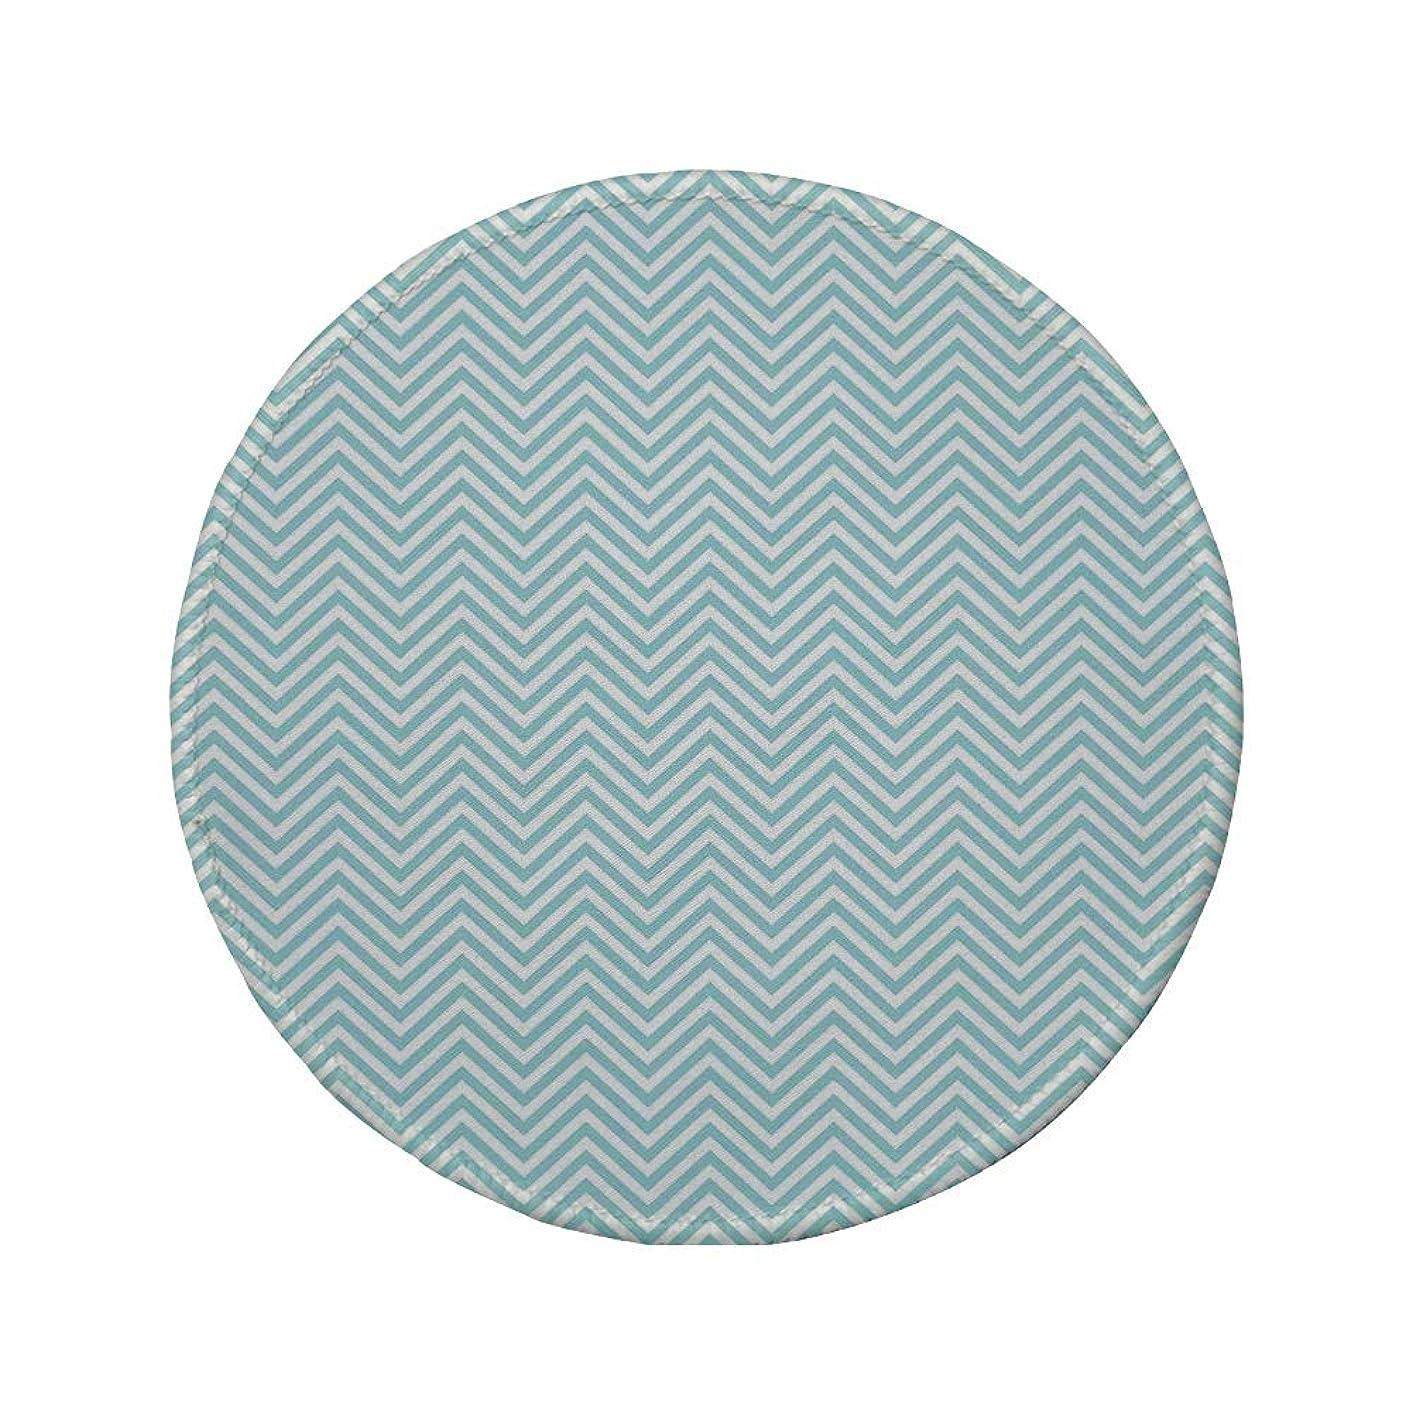 Non-Slip Rubber Round Mouse Pad,Retro,Big White Dots Spots Little Circles Shabby Pastel Colors Symmetrical Monochrome,Light Blue White,11.8